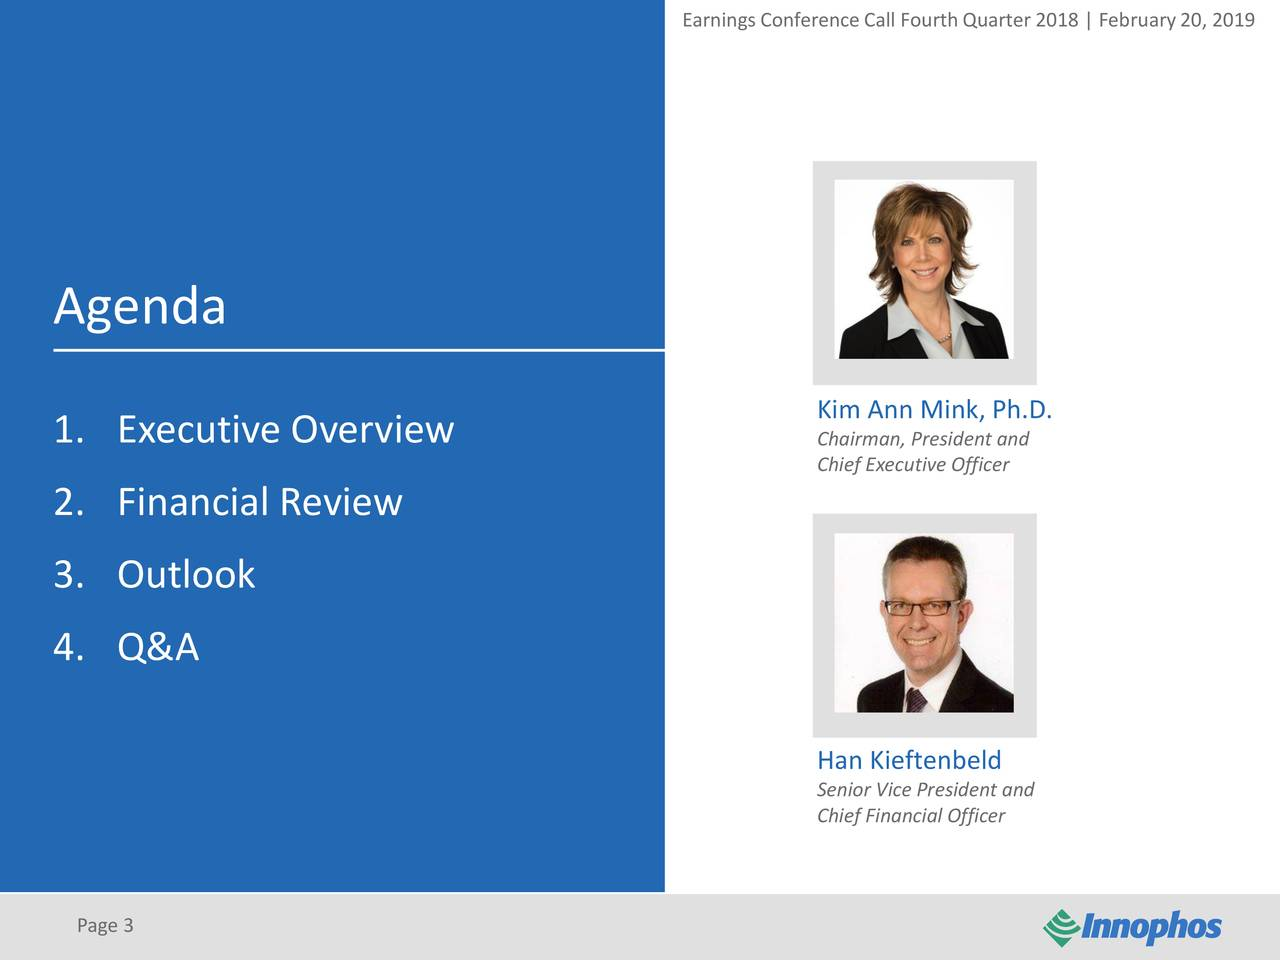 Agenda Kim Ann Mink, Ph.D. 1. Executive Overview Chairman, President and Chief Executive Officer 2. Financial Review 3. Outlook 4. Q&A Han Kieftenbeld Senior Vice President and Chief Financial Officer Page 3